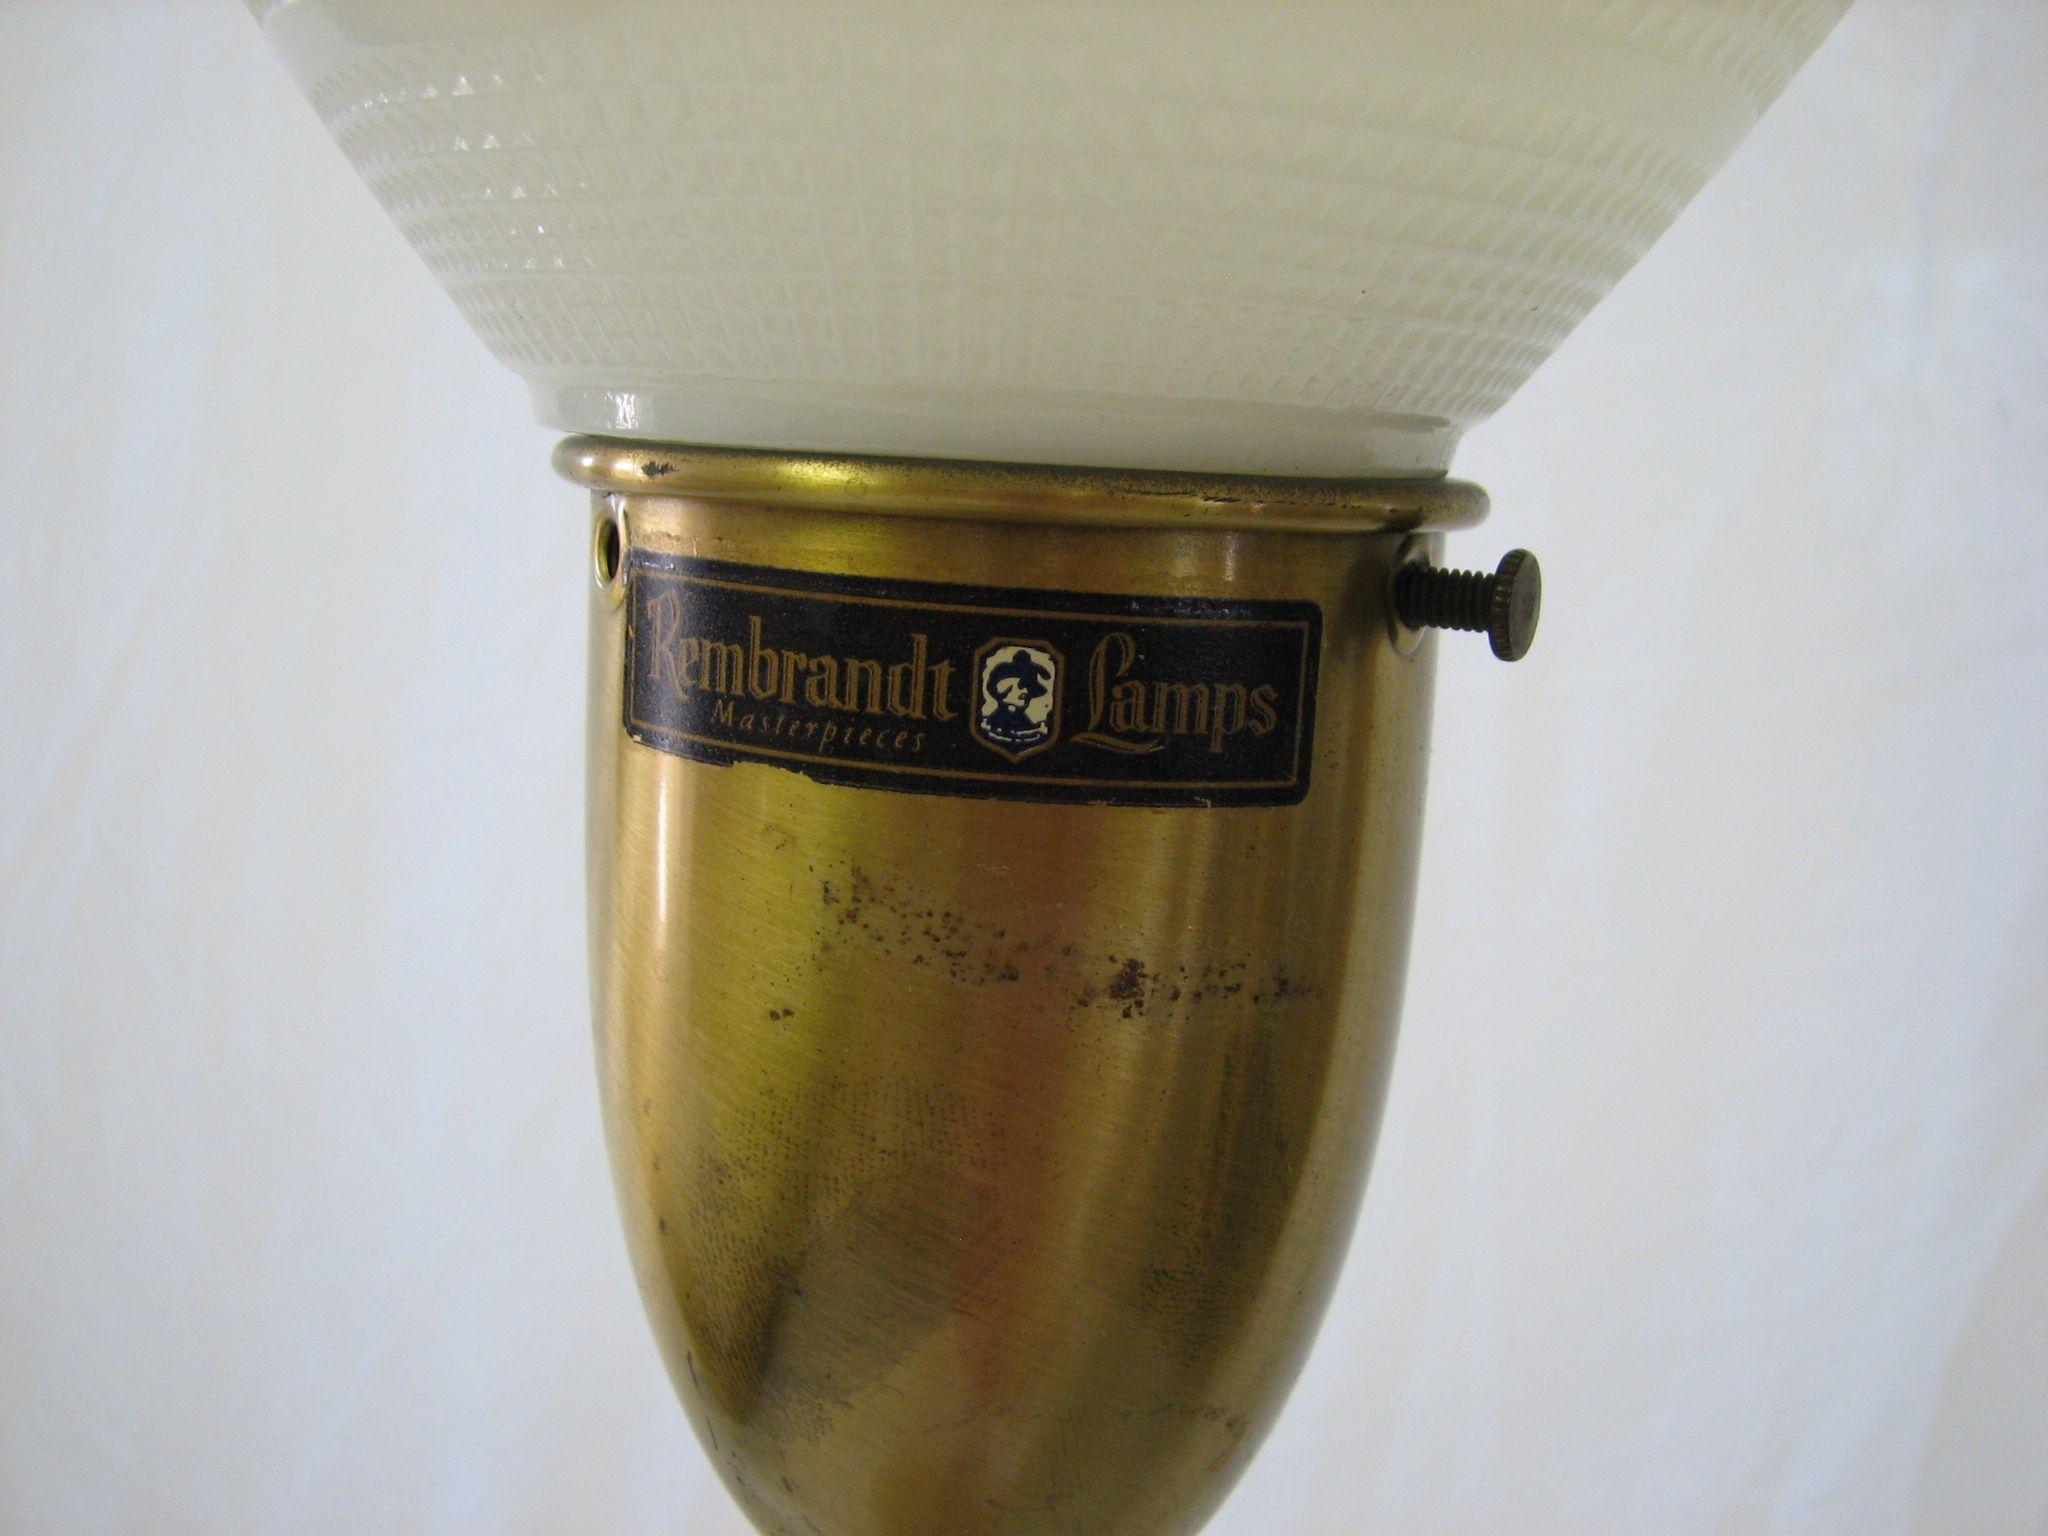 Superior Rembrandt Lamp Label